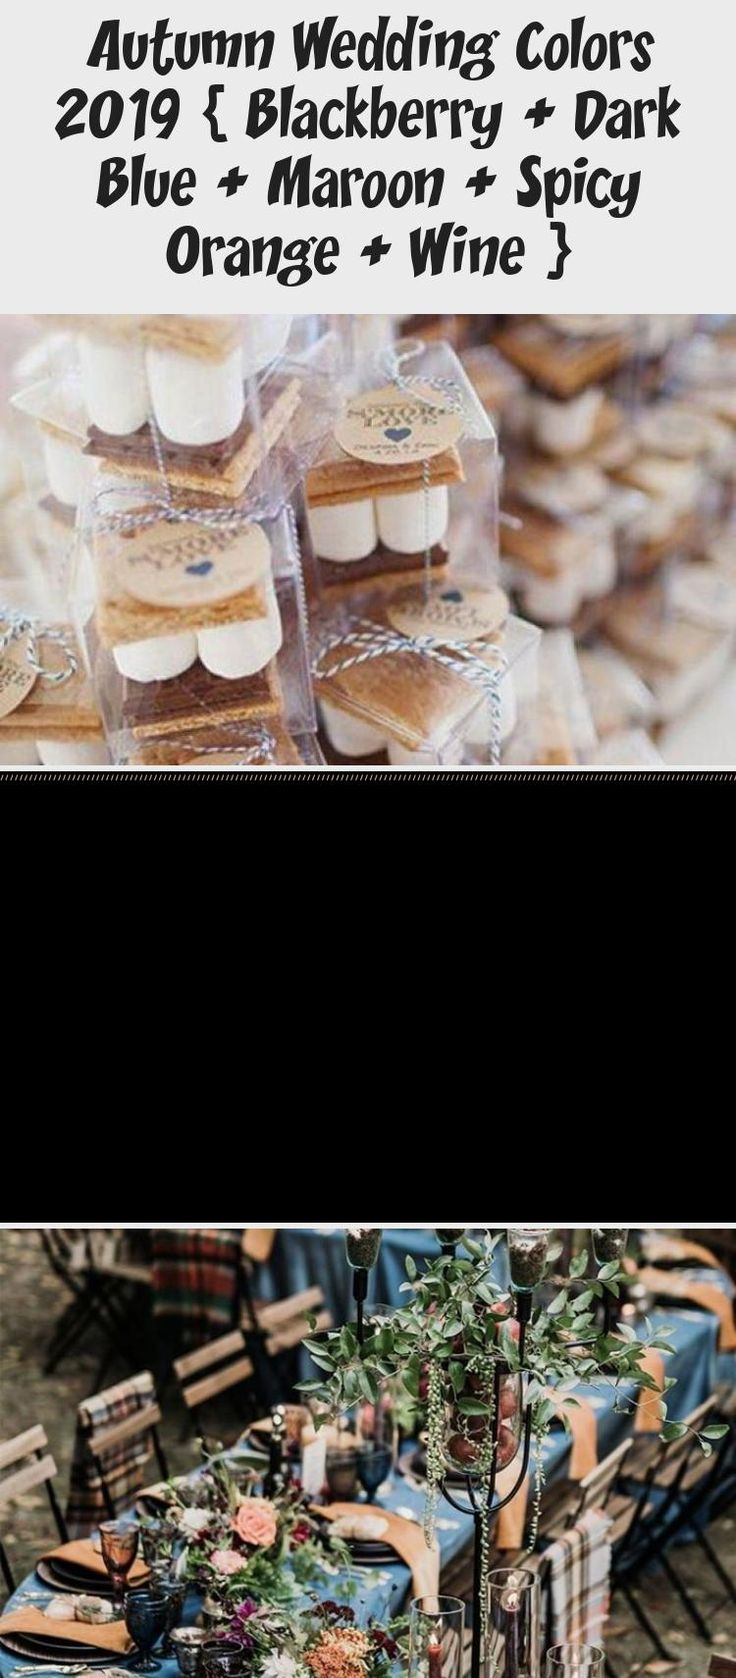 Autumn wedding colors 2019 { Blackberry + Dark Blue + Maroon + Spicy Orange + Wine } #color #fall #autumn #wedding #BridesmaidDressesBoho #BridesmaidDressesMismatched #SimpleBridesmaidDresses #UniqueBridesmaidDresses #CasualBridesmaidDresses